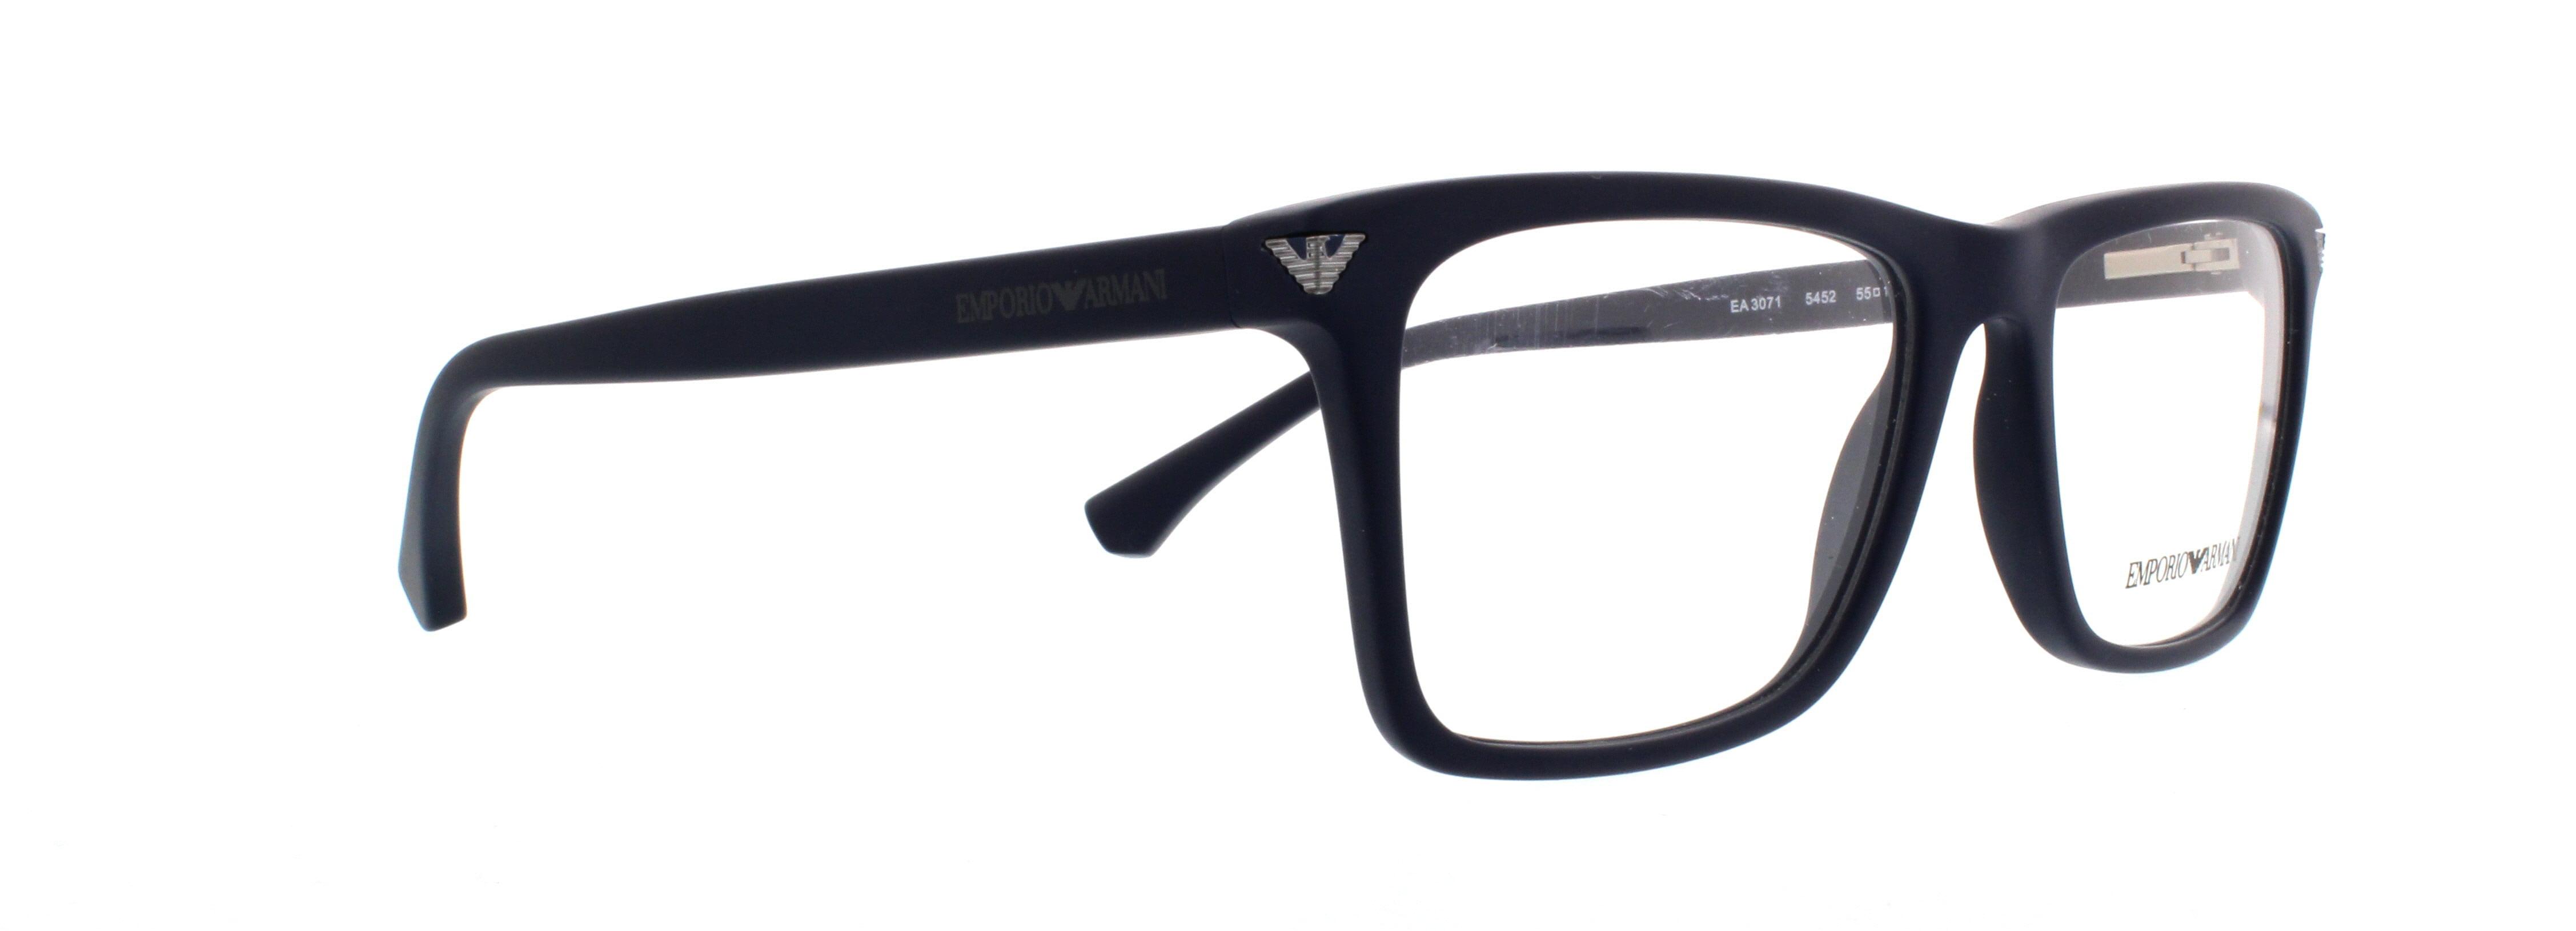 3b5a18fcb7a EMPORIO ARMANI Eyeglasses EA 3071 5452 Matte Blue 55MM - Walmart.com